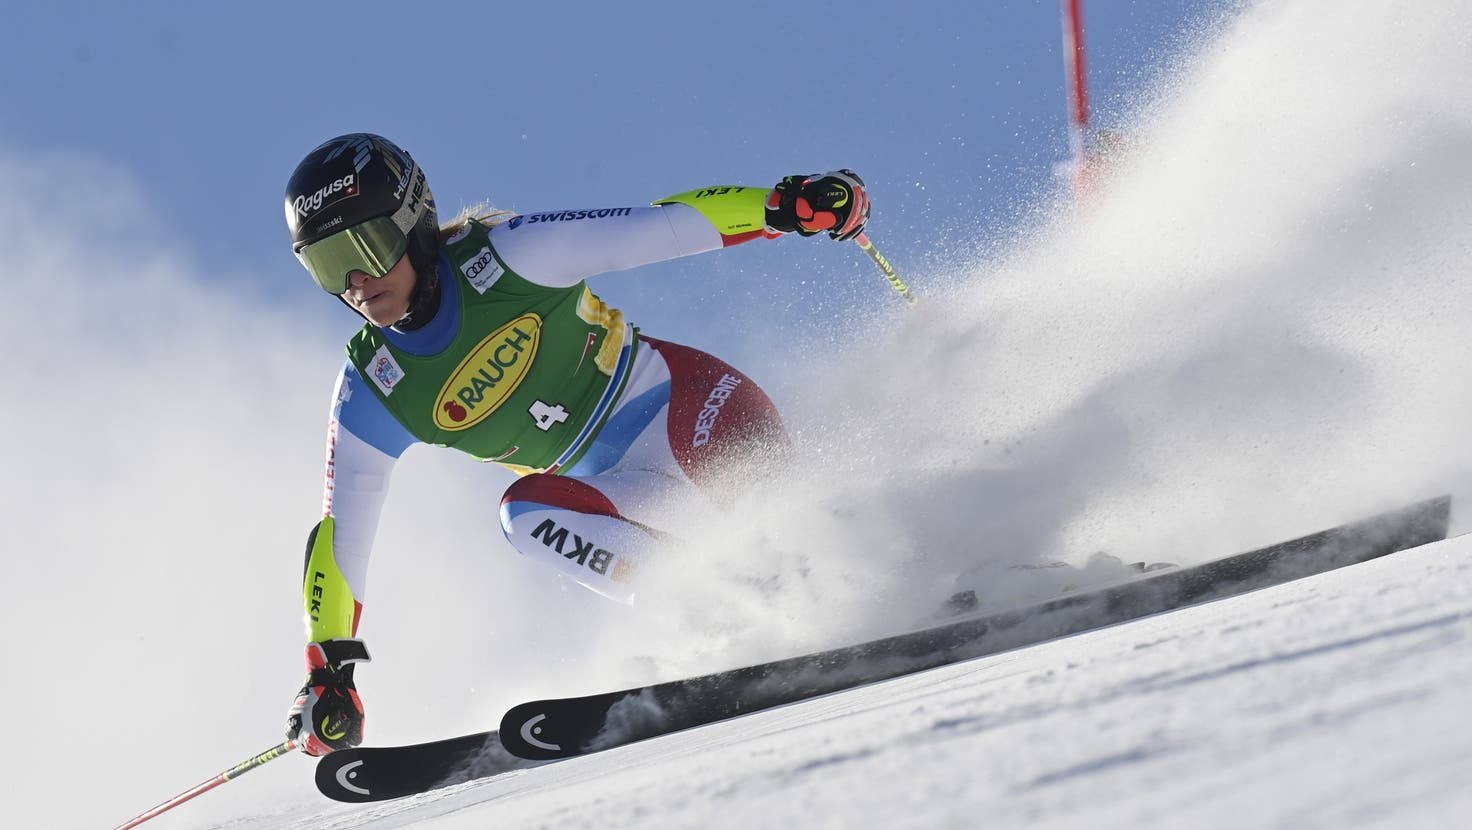 Switzerland's Lara Gut speeds down the course during the first run of an alpine ski, women's World Cup giant slalom in Soelden, Austria, Saturday, Oct. 28, 2017. (AP Photo/Alessandro Trovati) (Alessandro Trovati / AP)